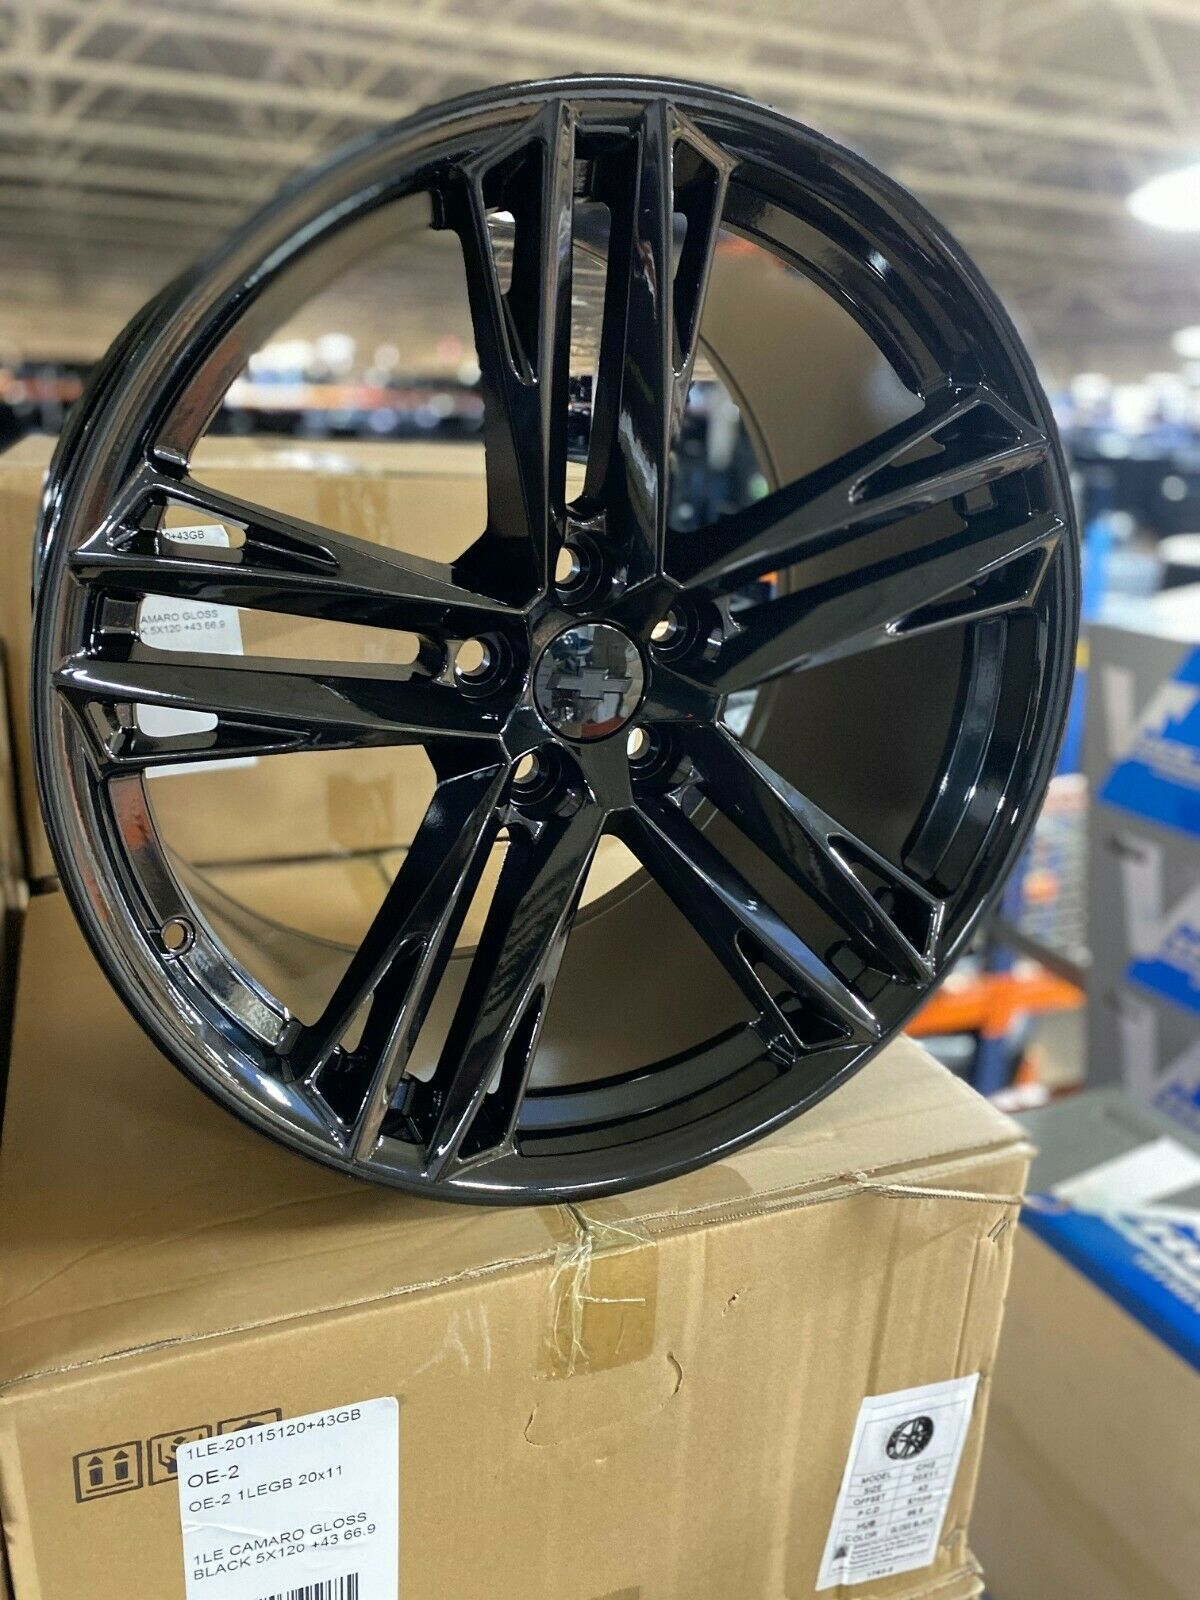 Zl1 Rims Black Camaro Black Wheels Camaro Rims